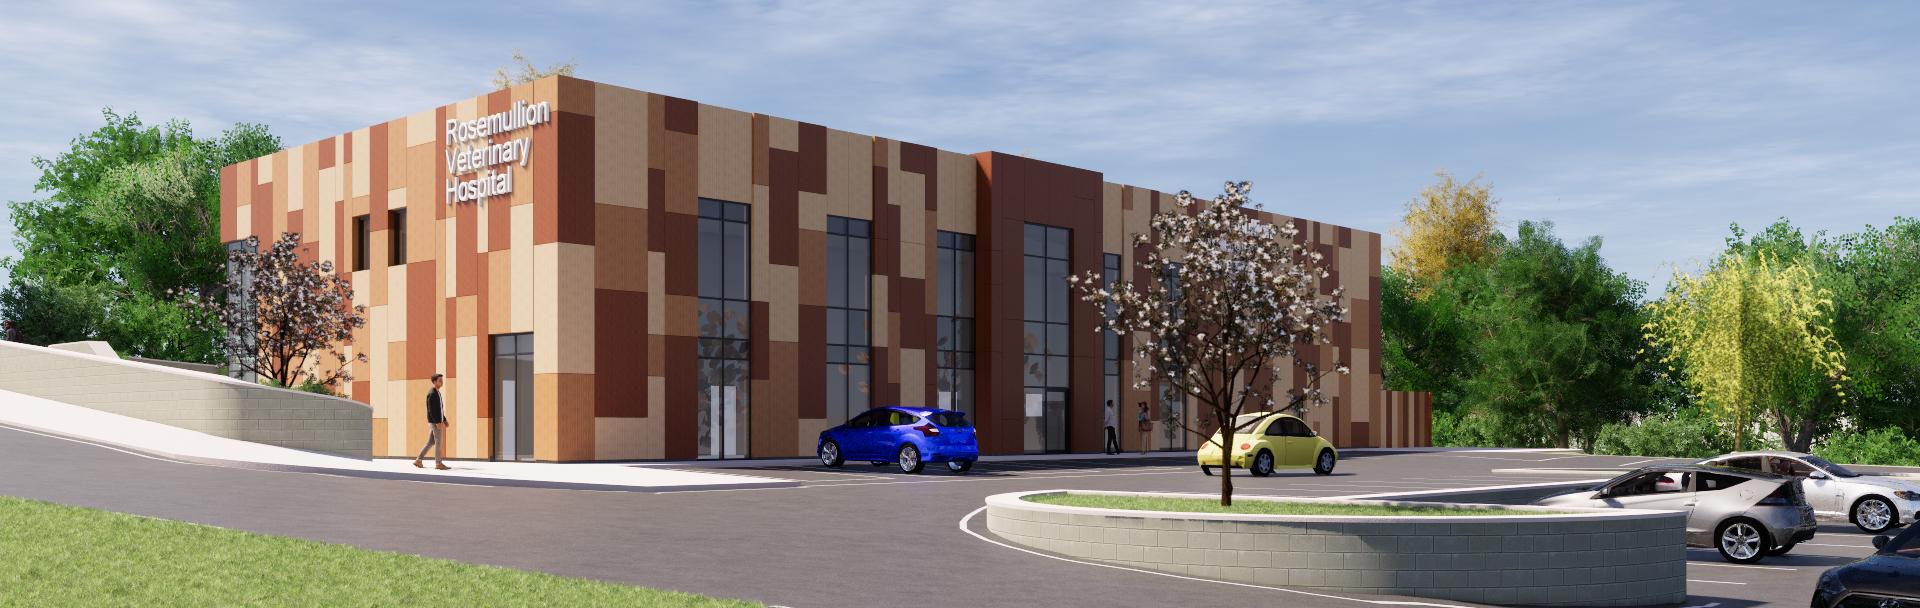 New hospital coming Summer 2021